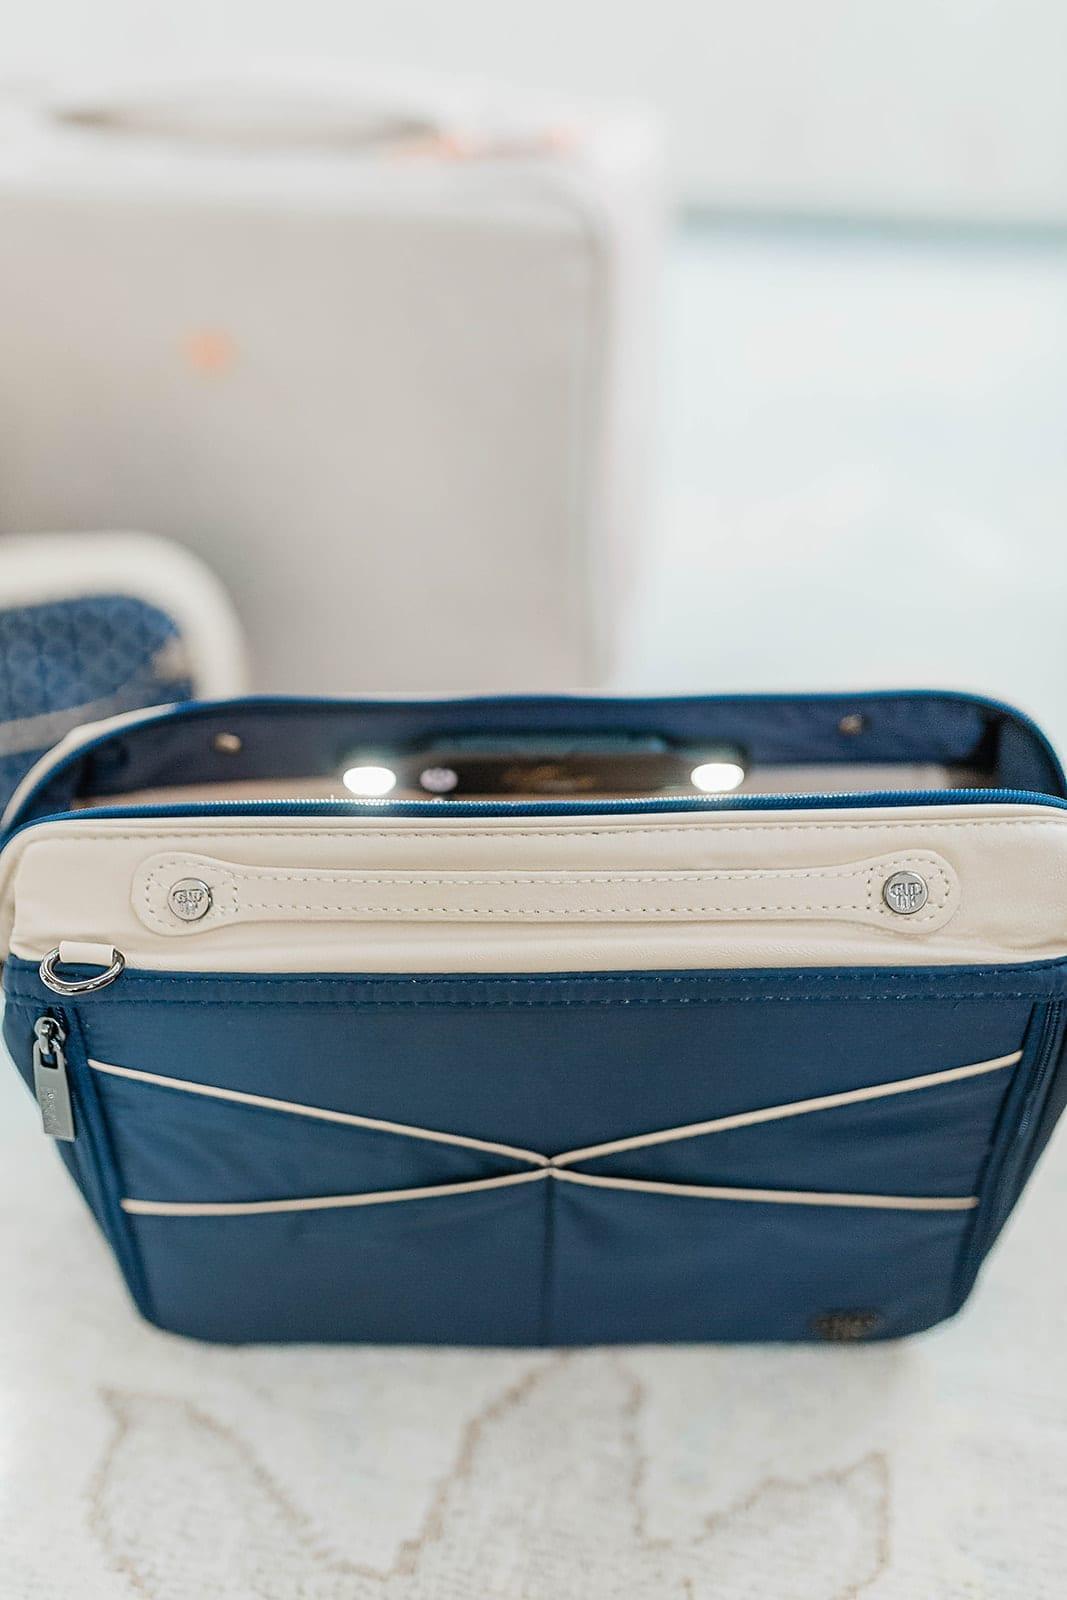 Bag with Light Inside